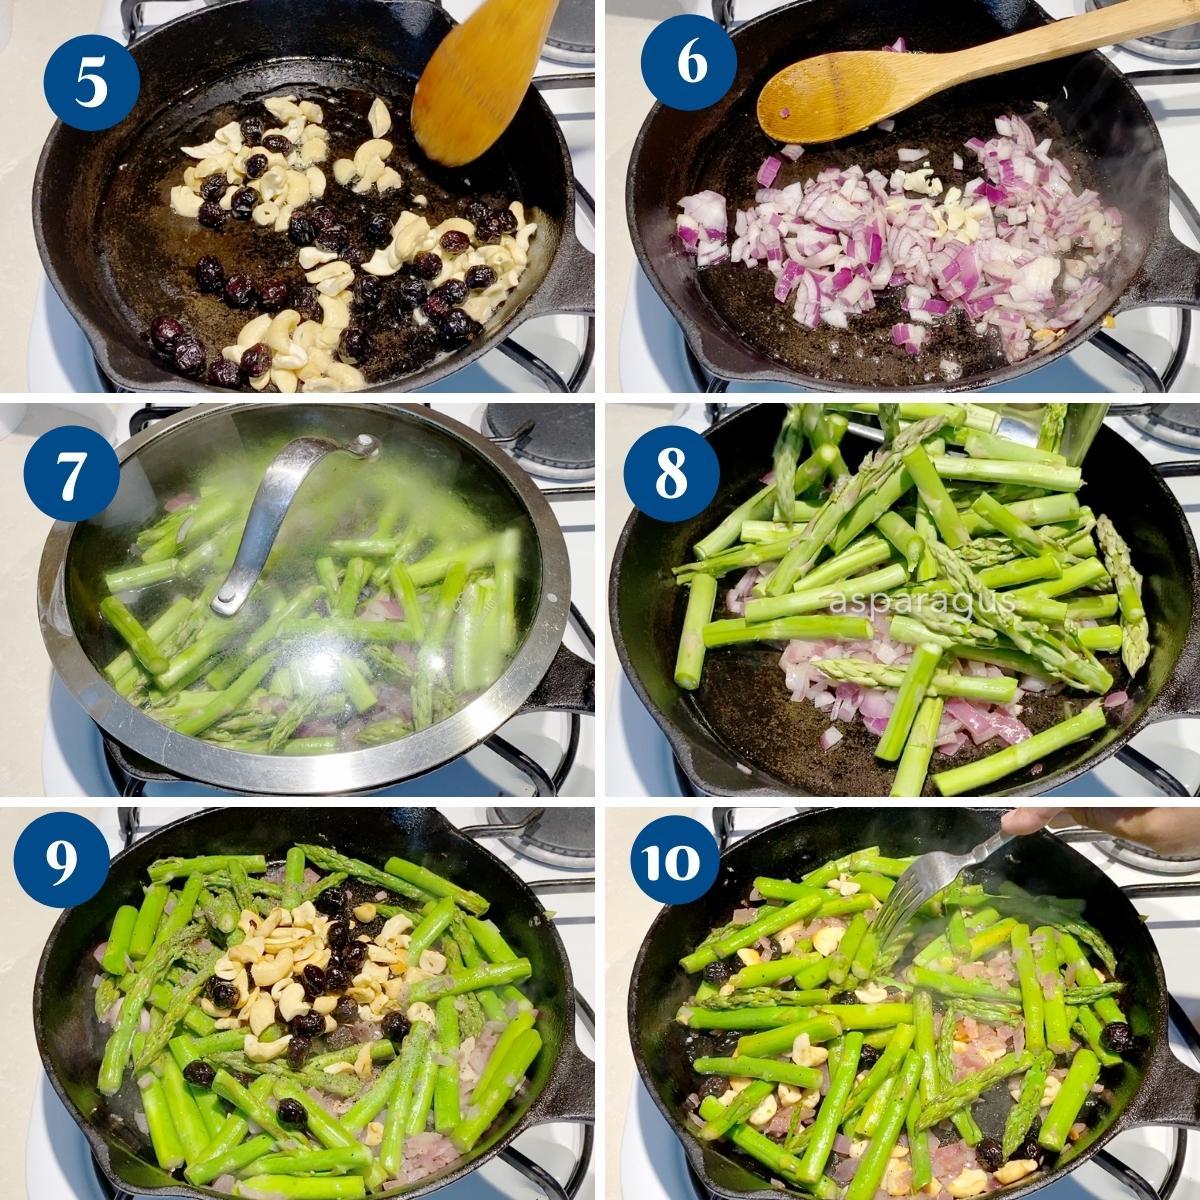 Progress pictures collage for sautéed asparagus.